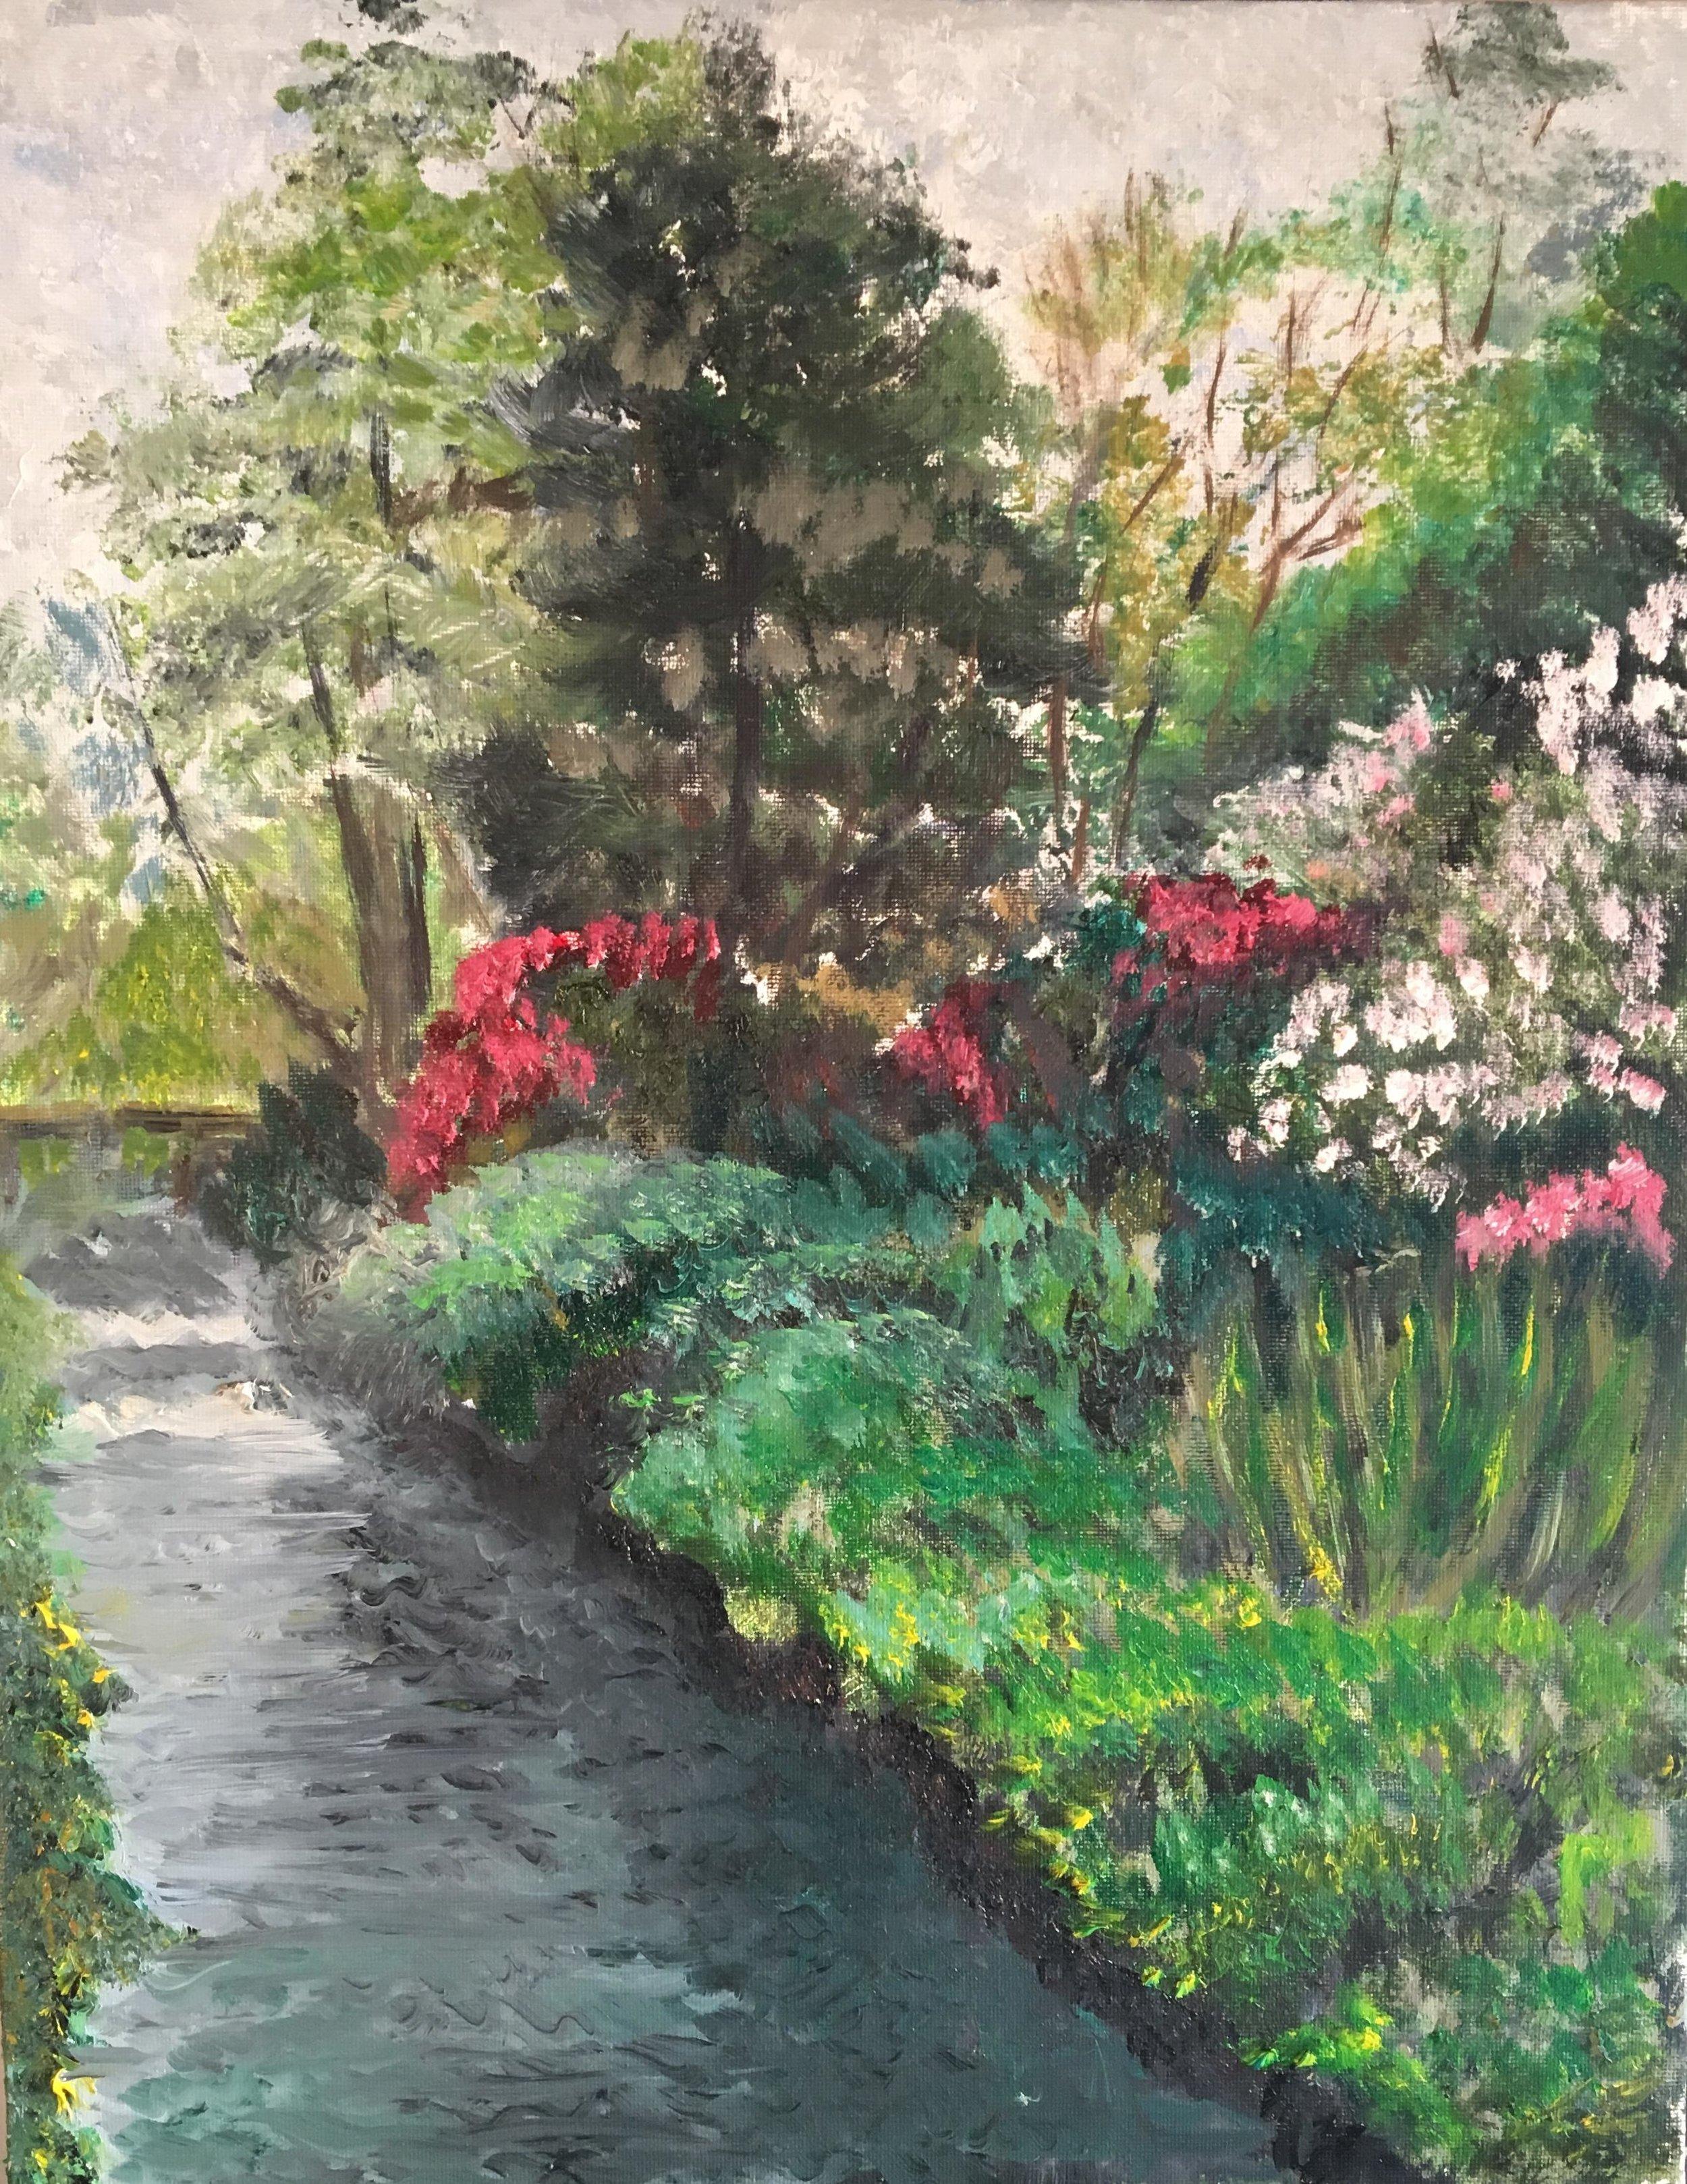 Print 2 - Bodnant Gardens - Size: 225 x 291